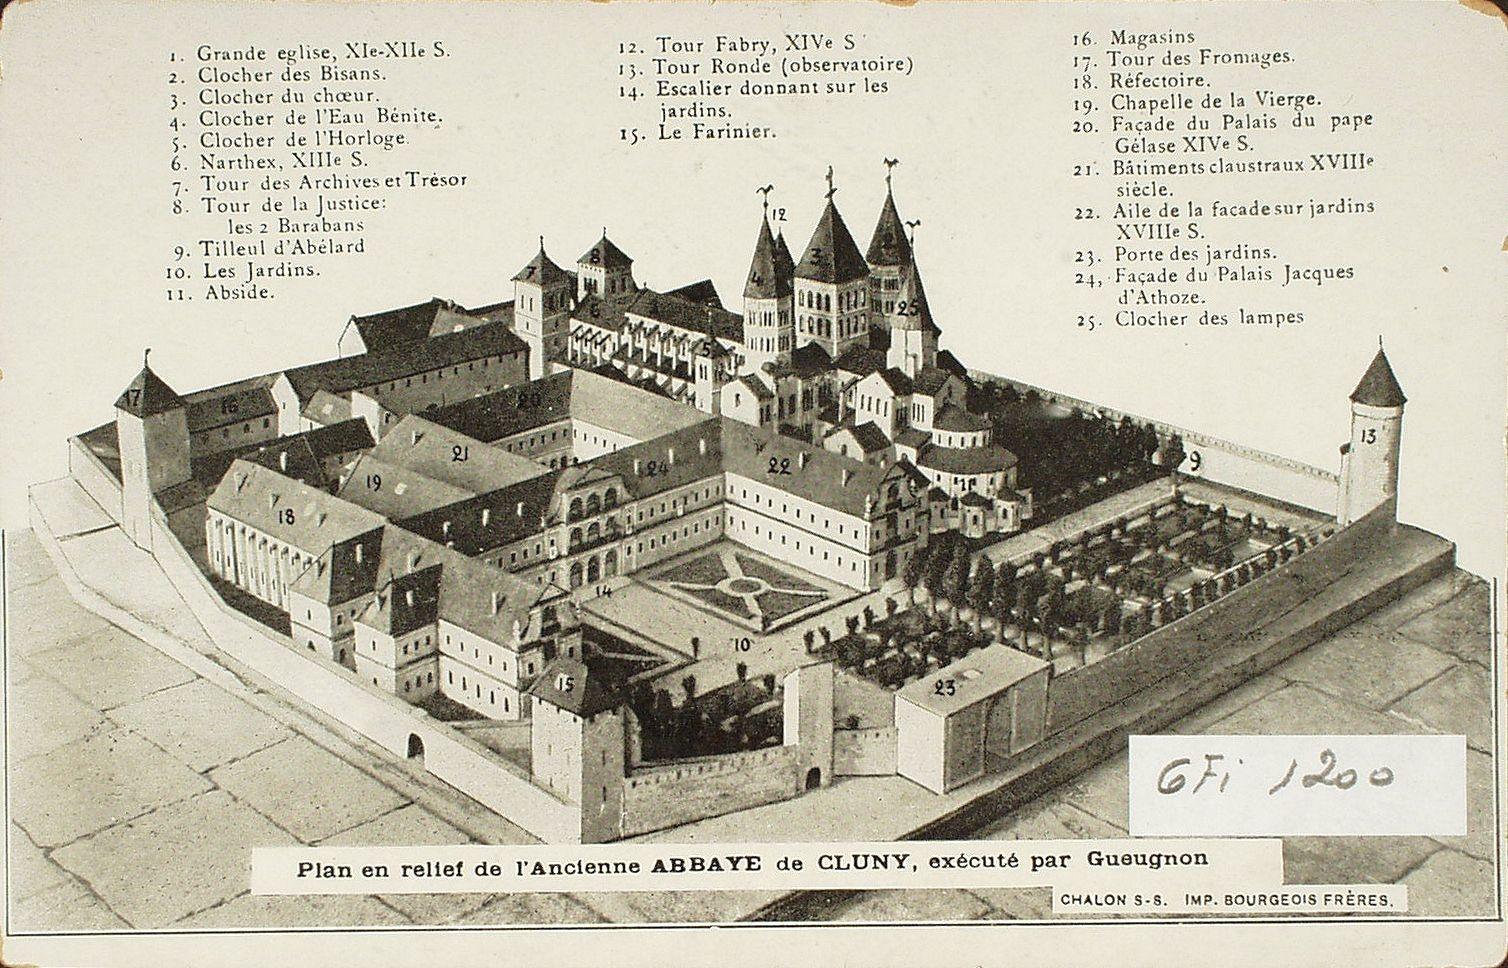 Cluny -  Plan en relief de l'ancienne Abbaye de Cluny, exécuté par Gueugnon.